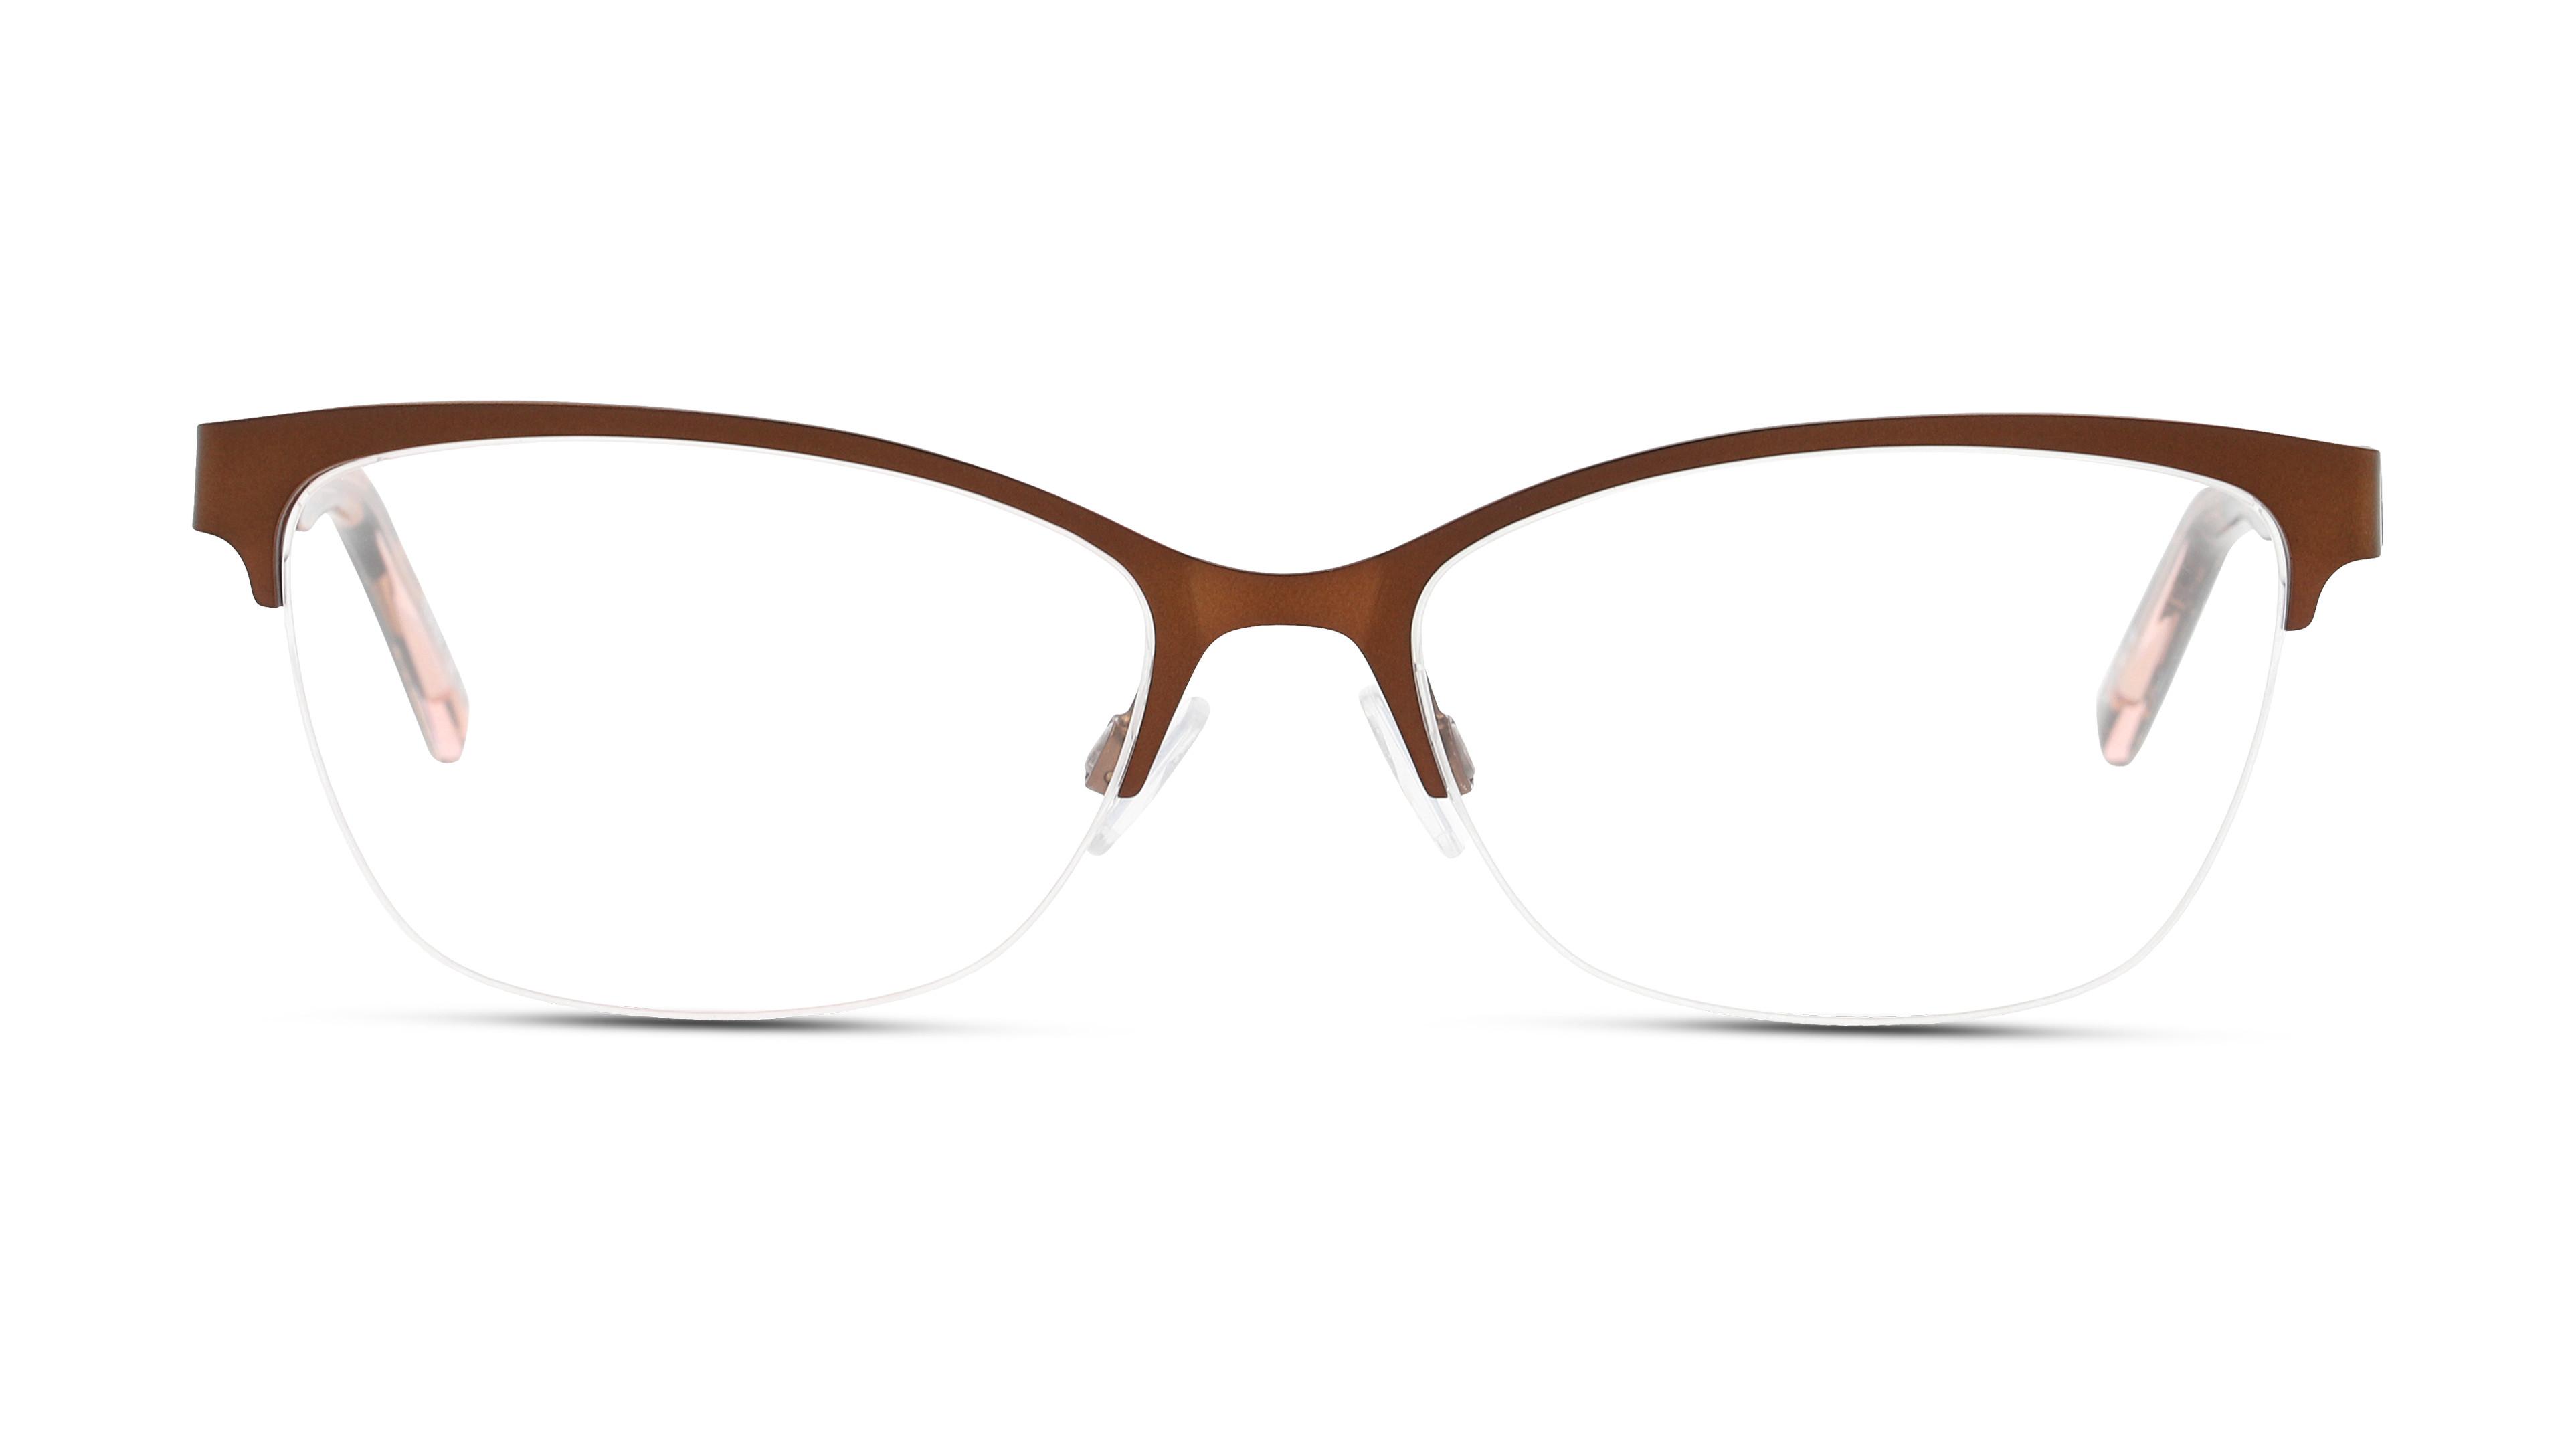 0716736270470-front-01-hugo-hg1079-eyewear-brwn-hvna